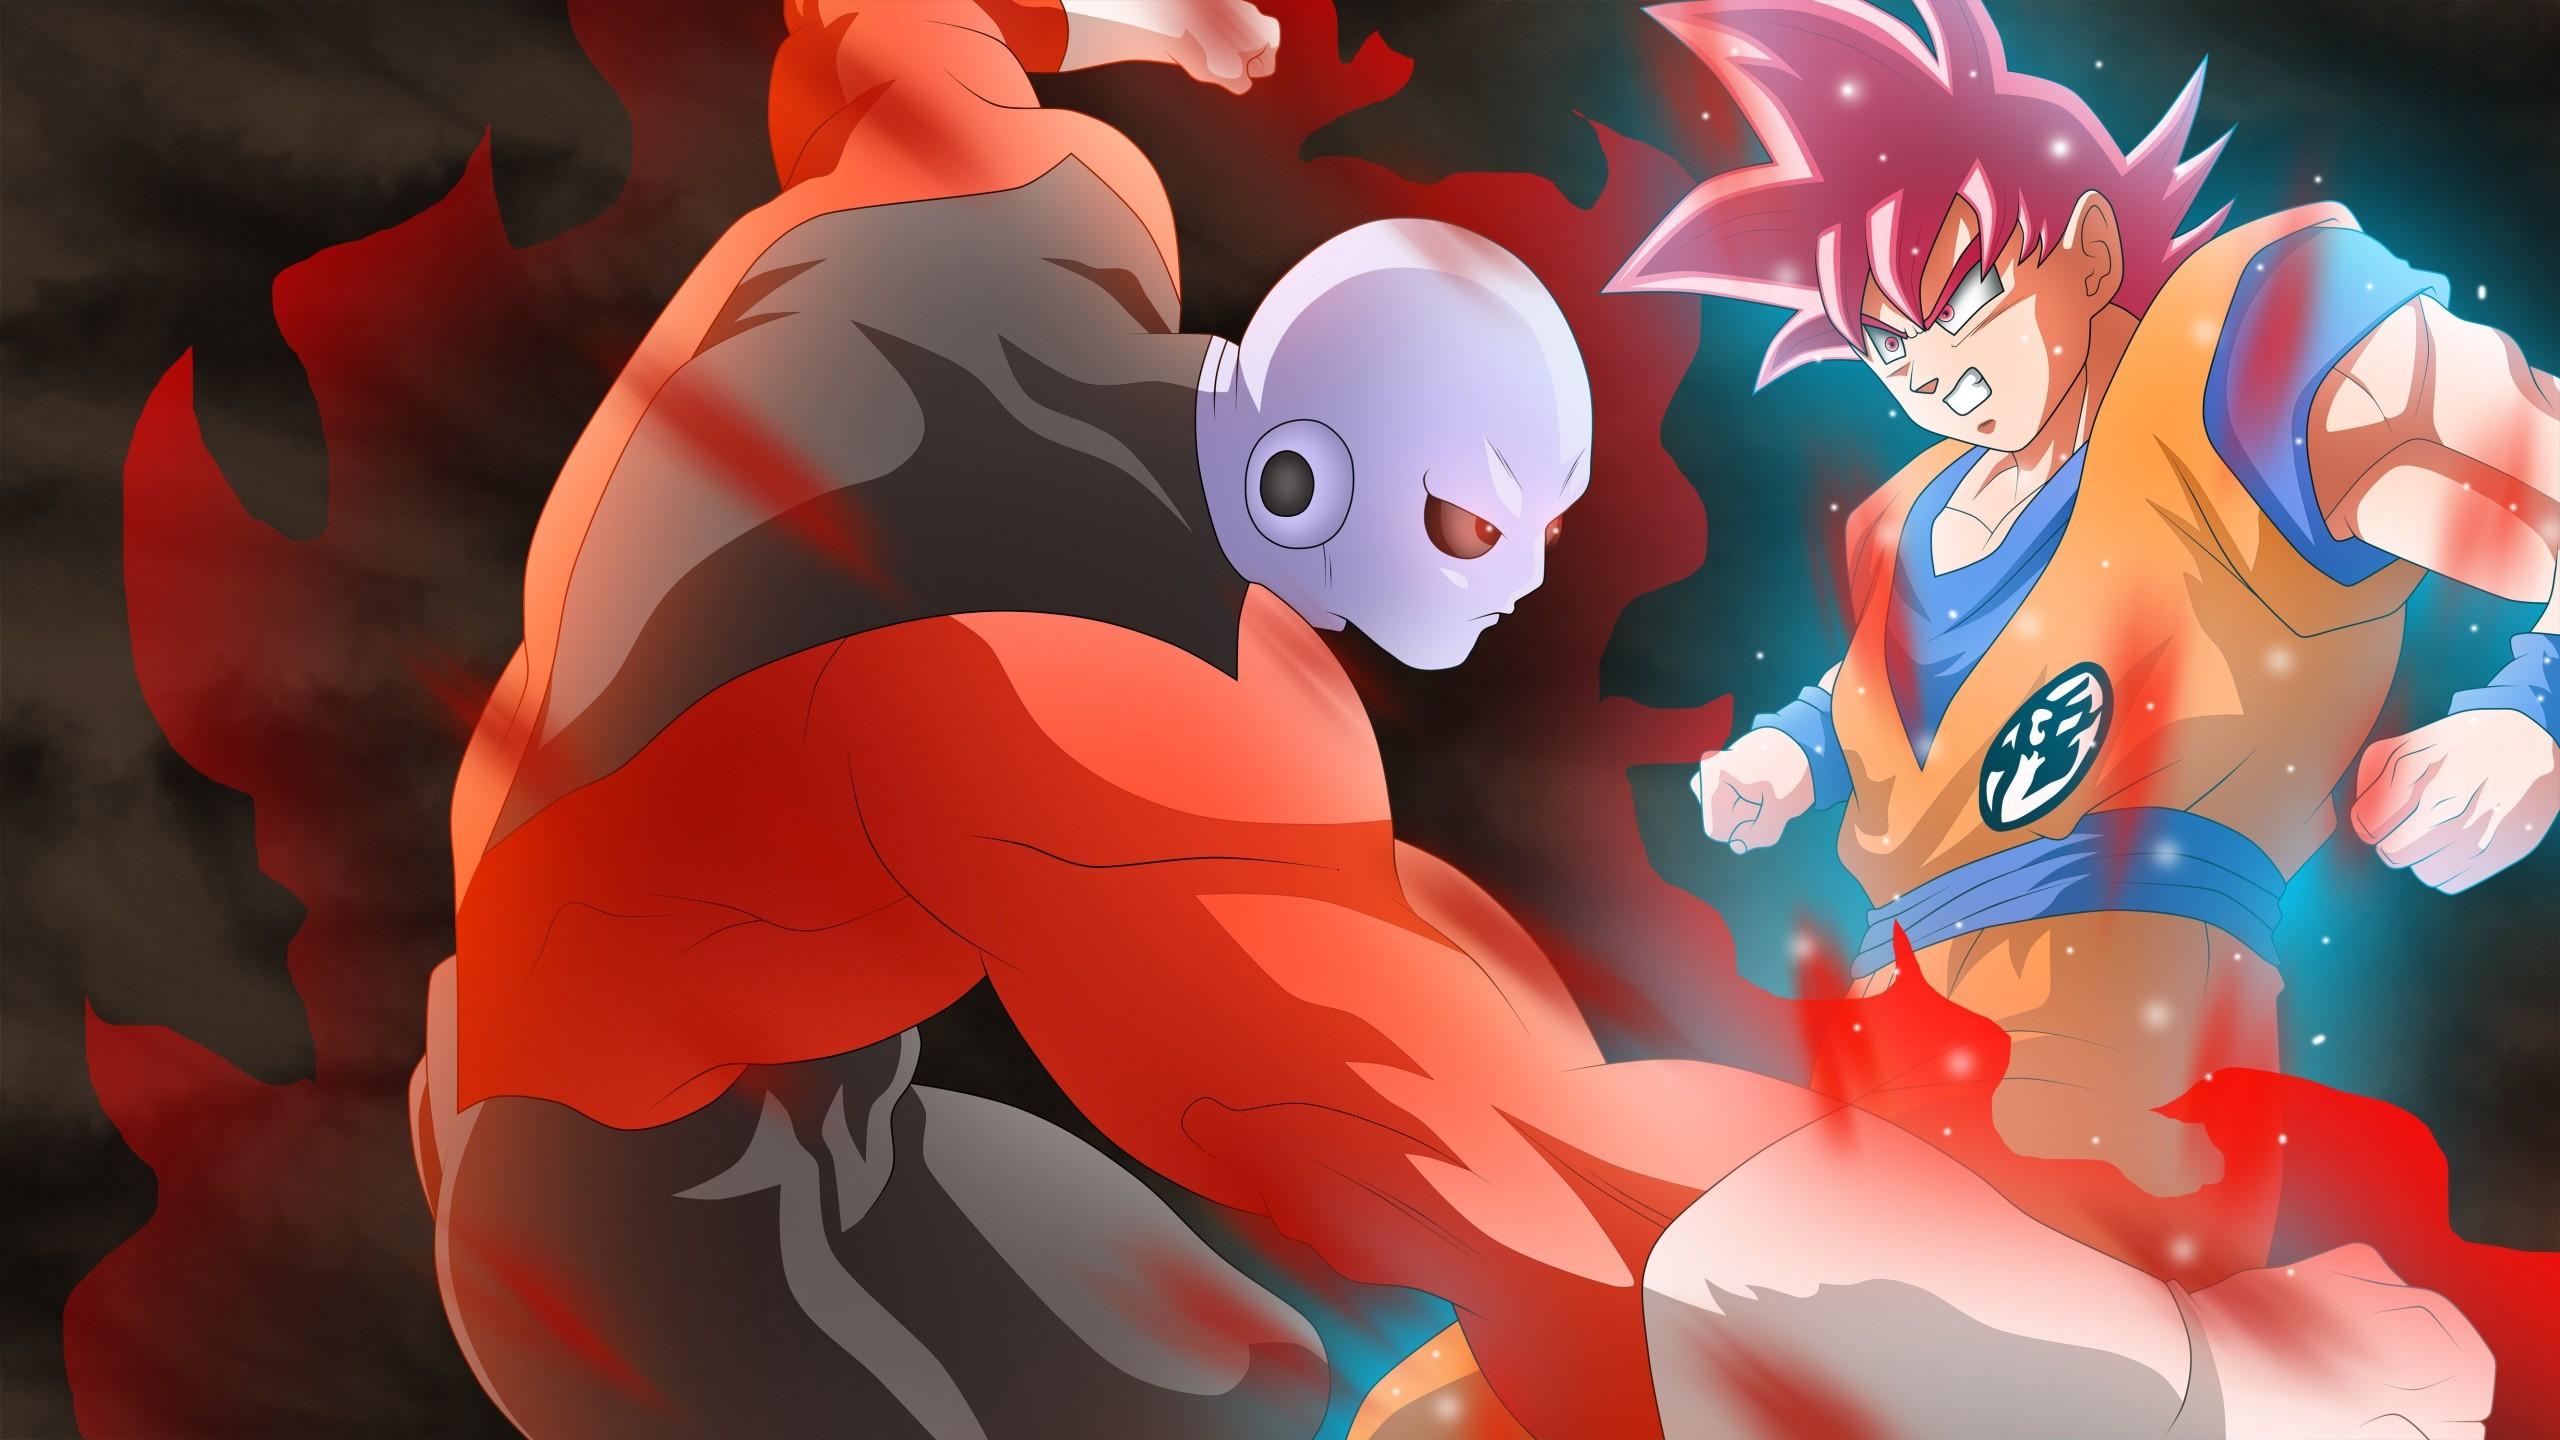 Jiren vs Goku Dragon Ball Super Wallpaper